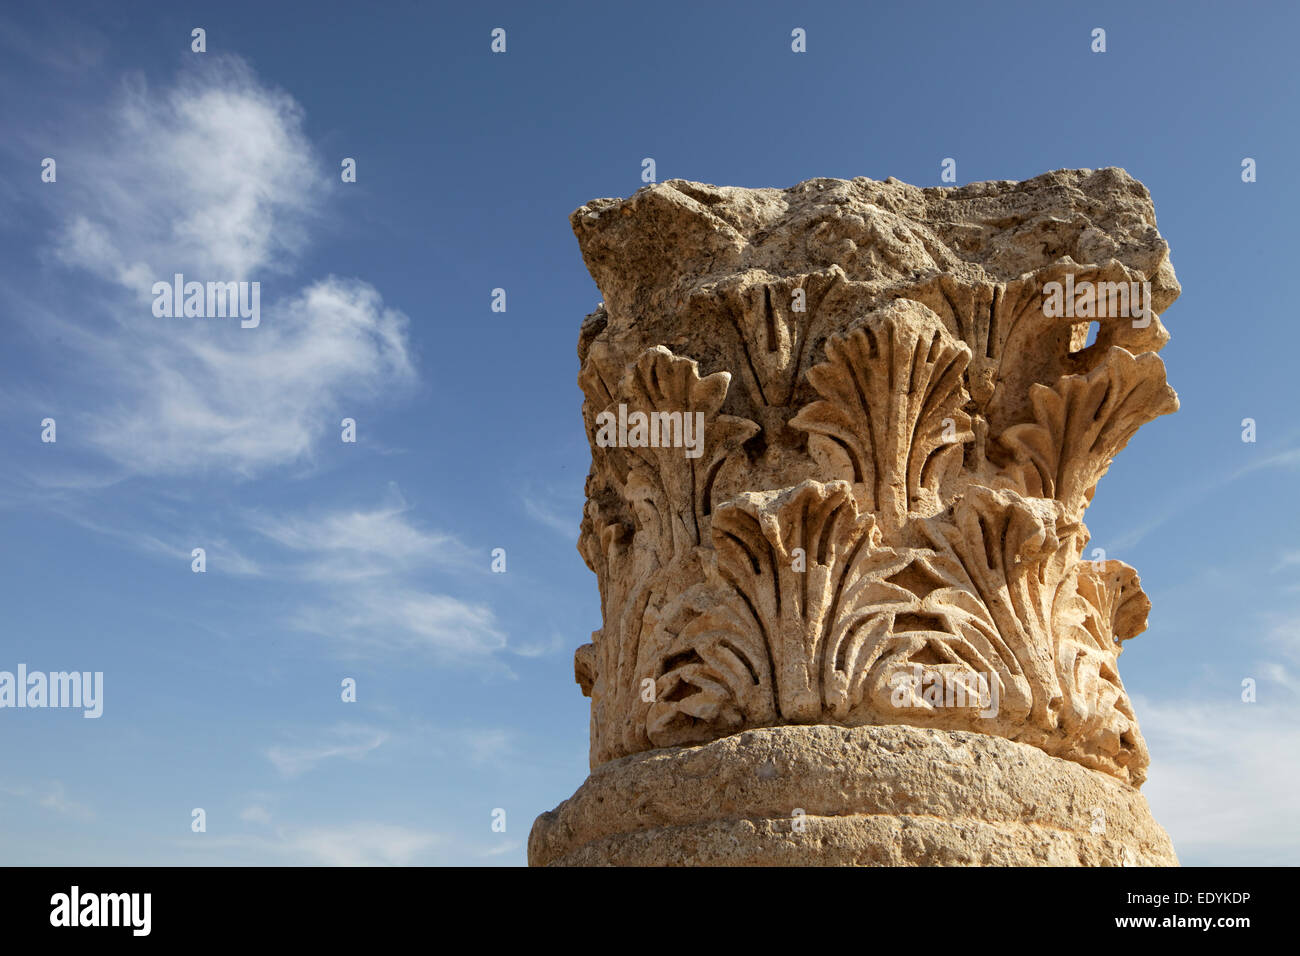 Column head, ancient Roman city of Jerash, part of the Decapolis, Jerash, Jerash Governorate, Jordan - Stock Image